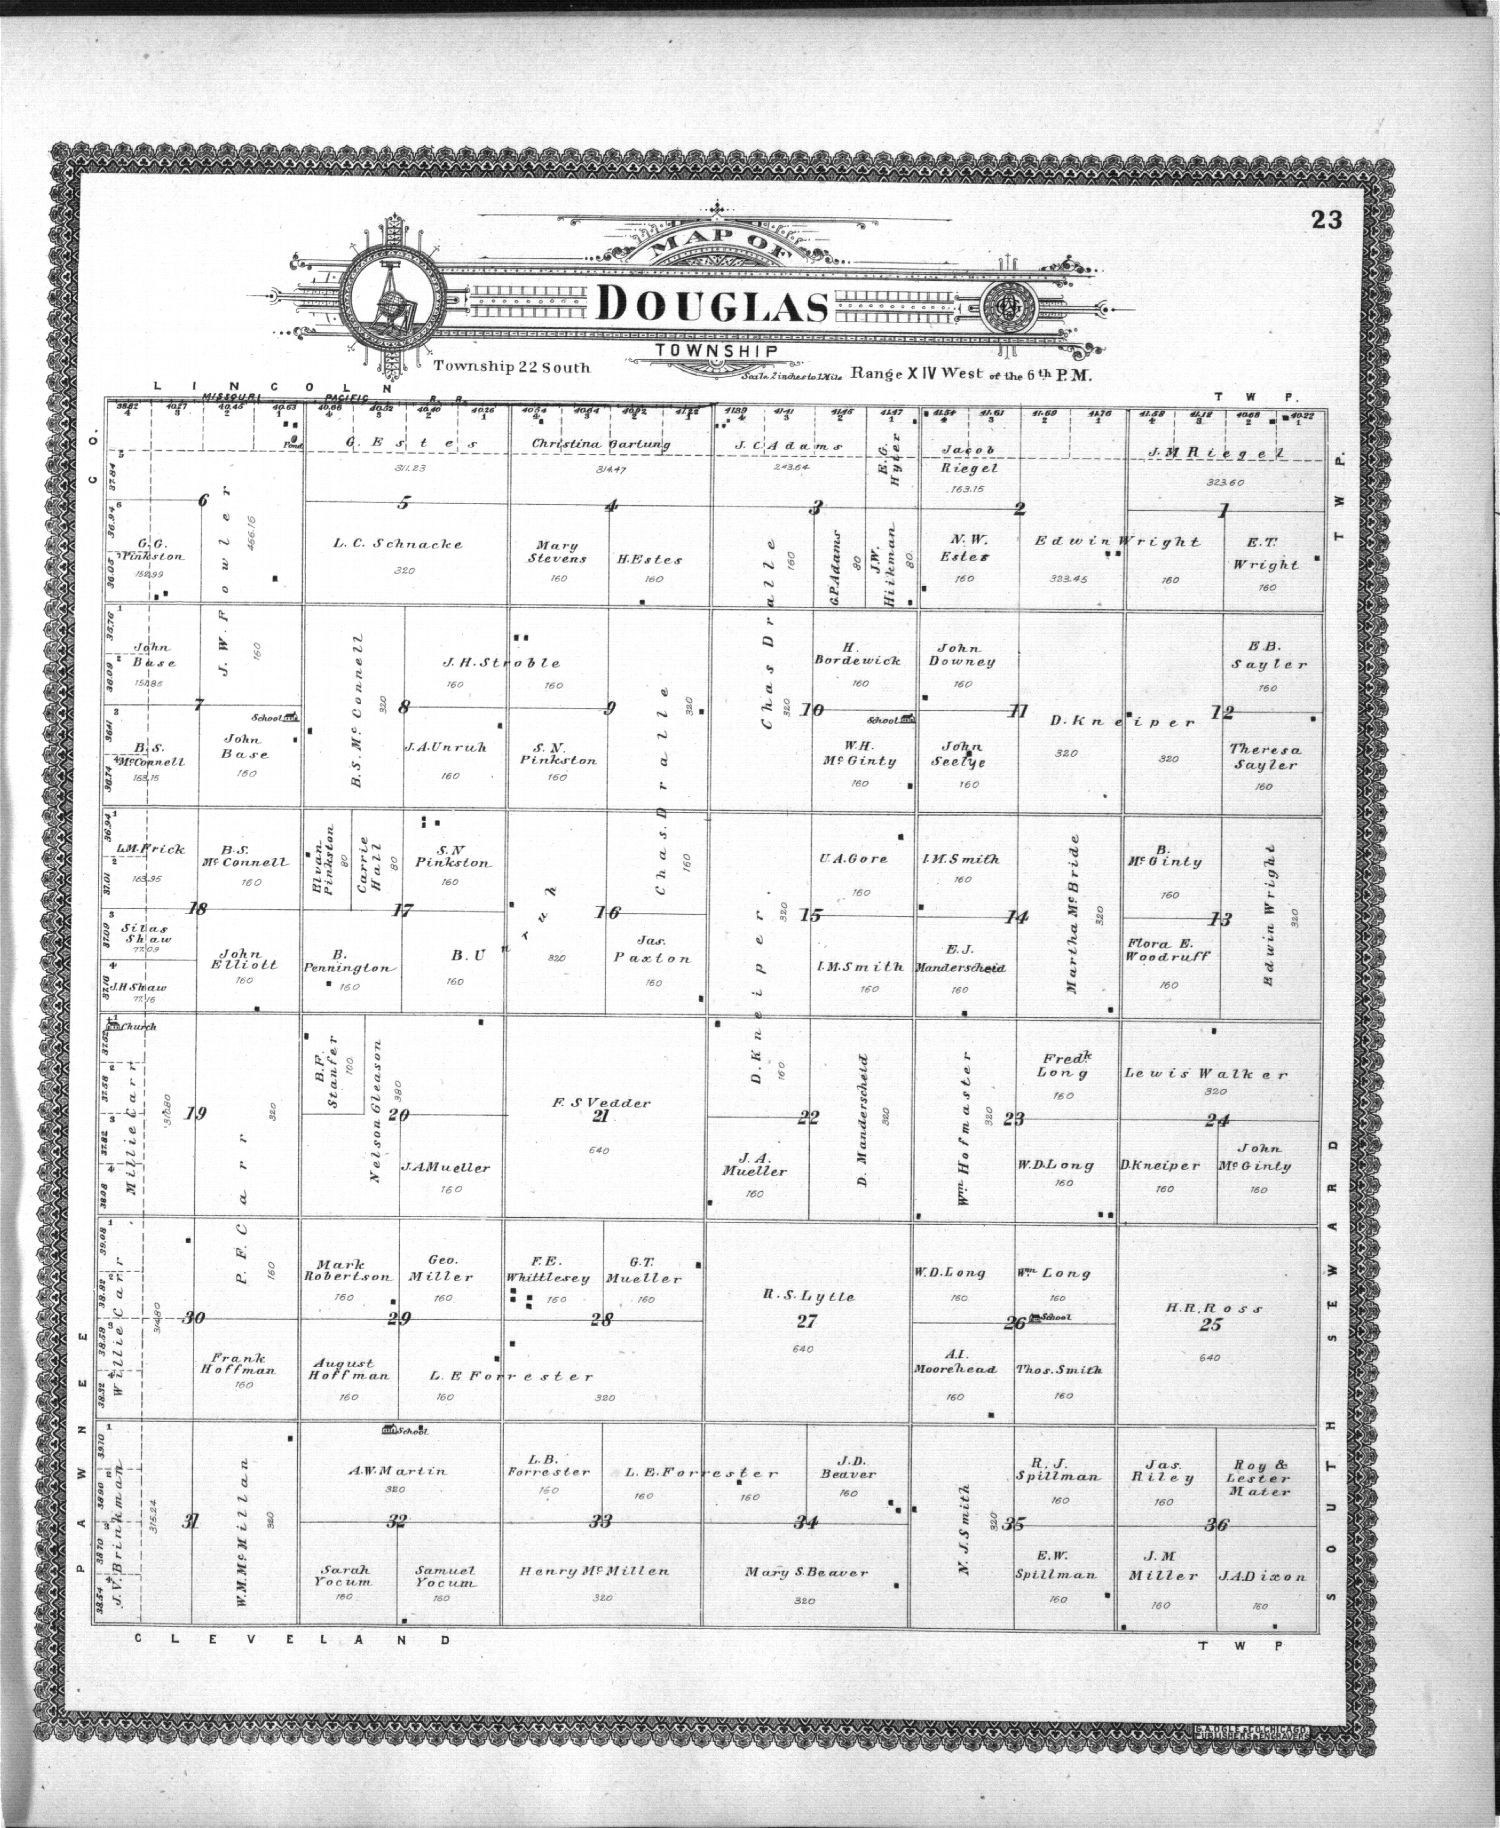 Standard atlas of Stafford County, Kansas - 23